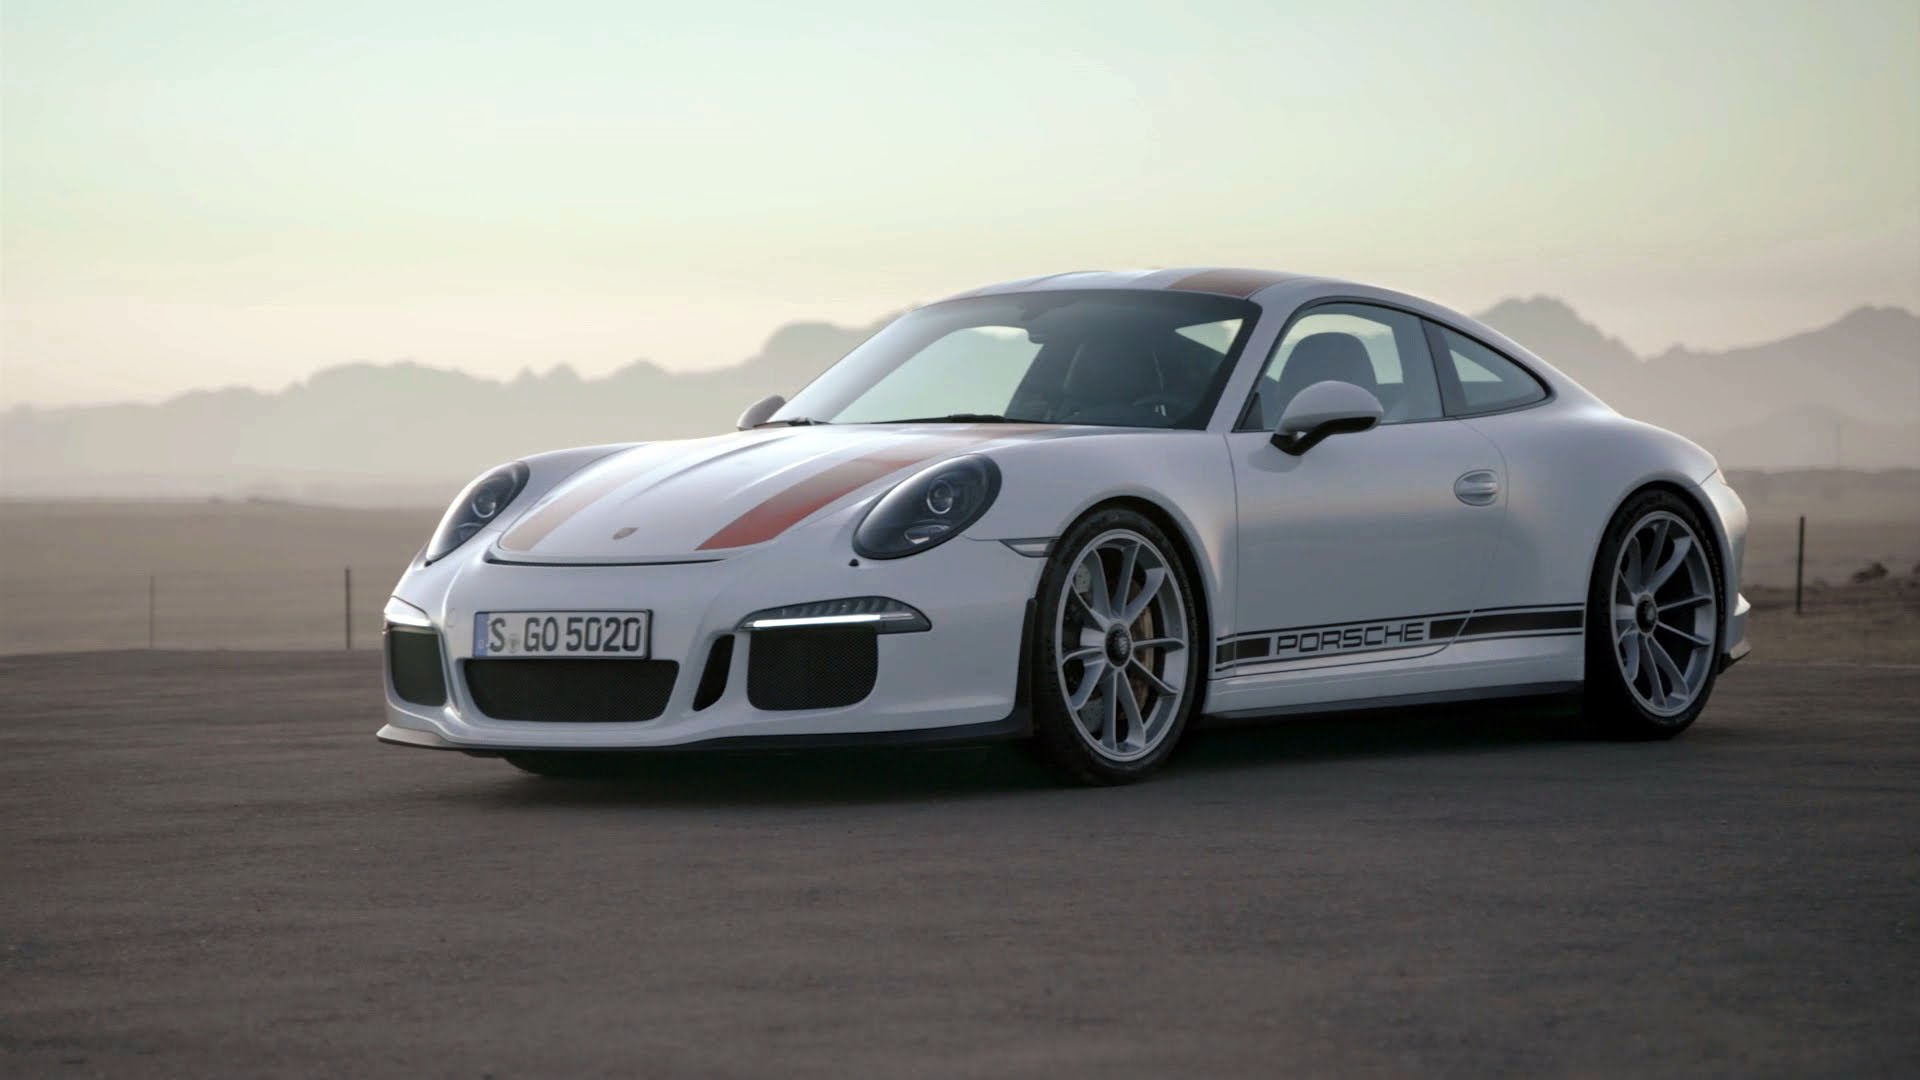 Porsche 911 R   Rennsport R Fahrung 1920x1080